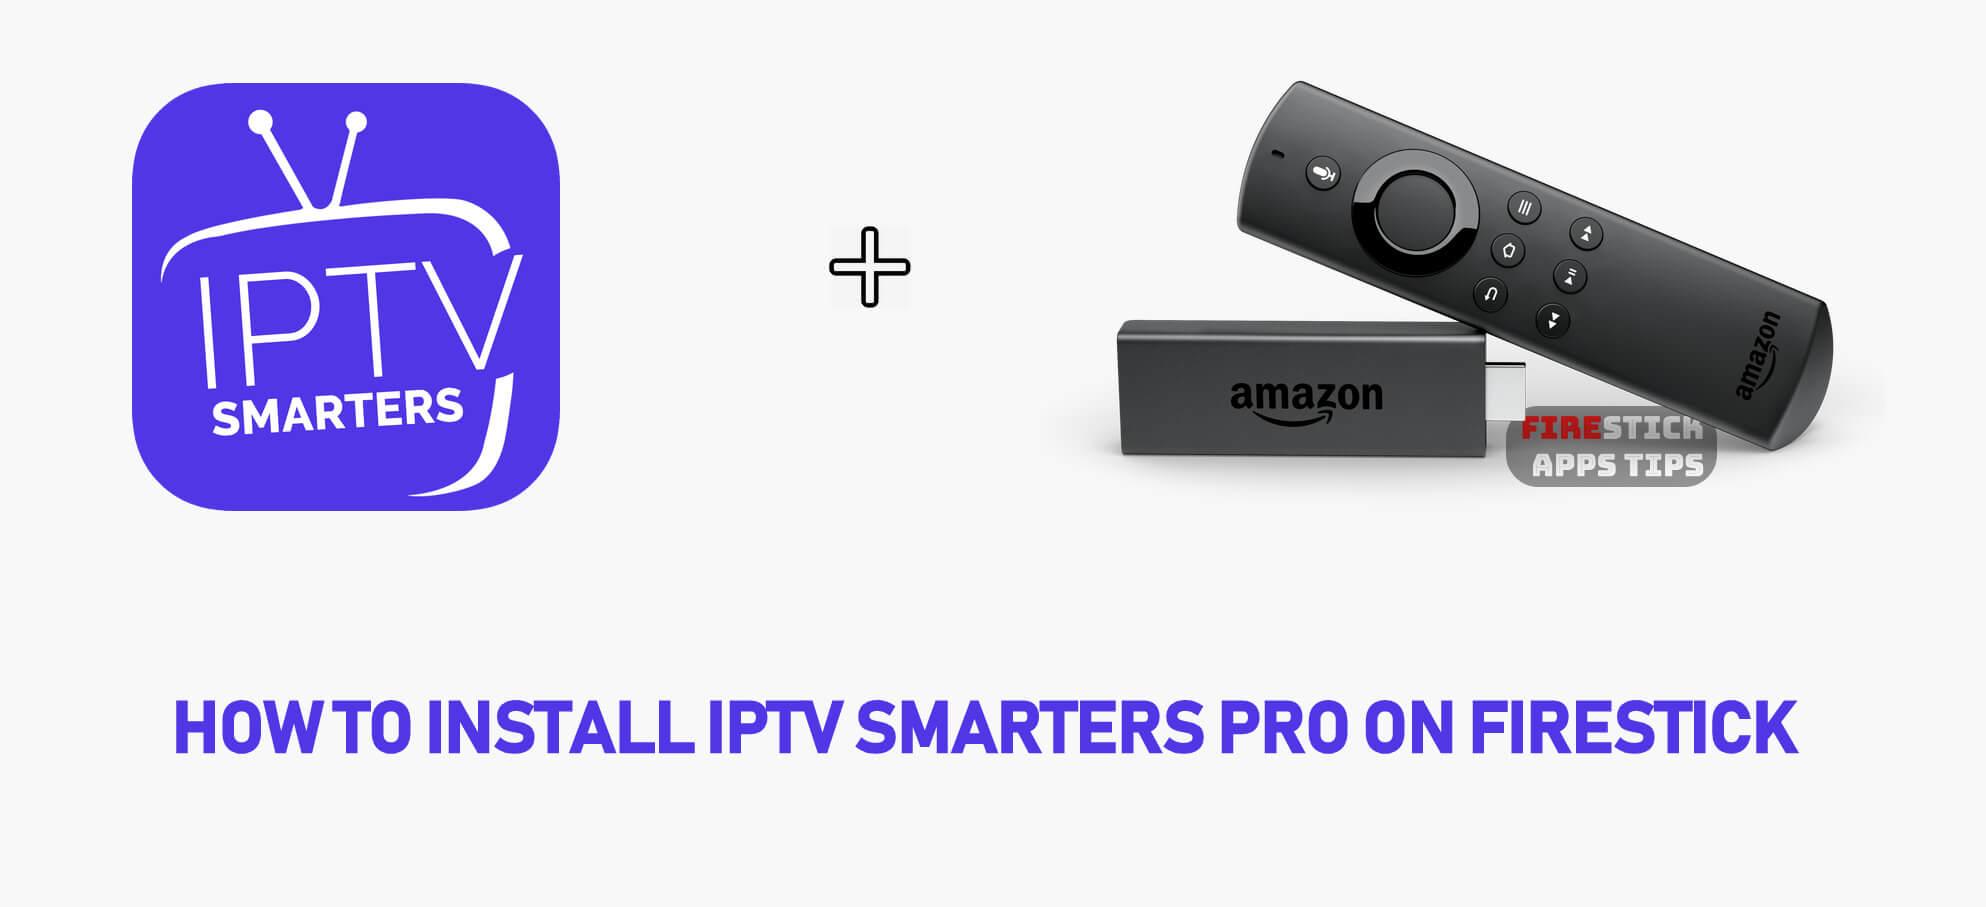 Cách cài đặt IPTV Smarters Pro trong Firestick [2020] 2